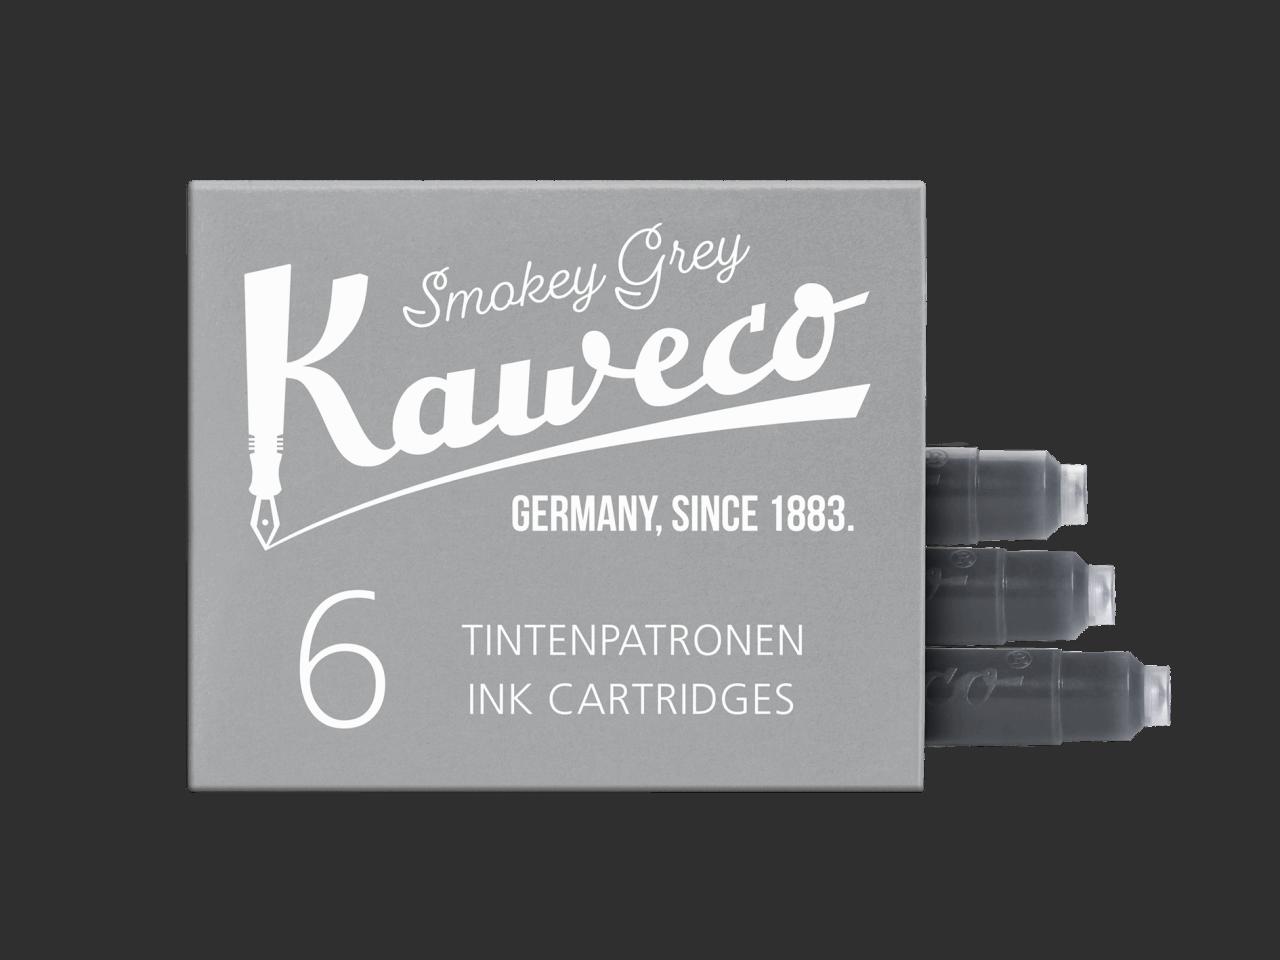 Kaweco Tintenpatronen 6 Stück - Smoke Grey